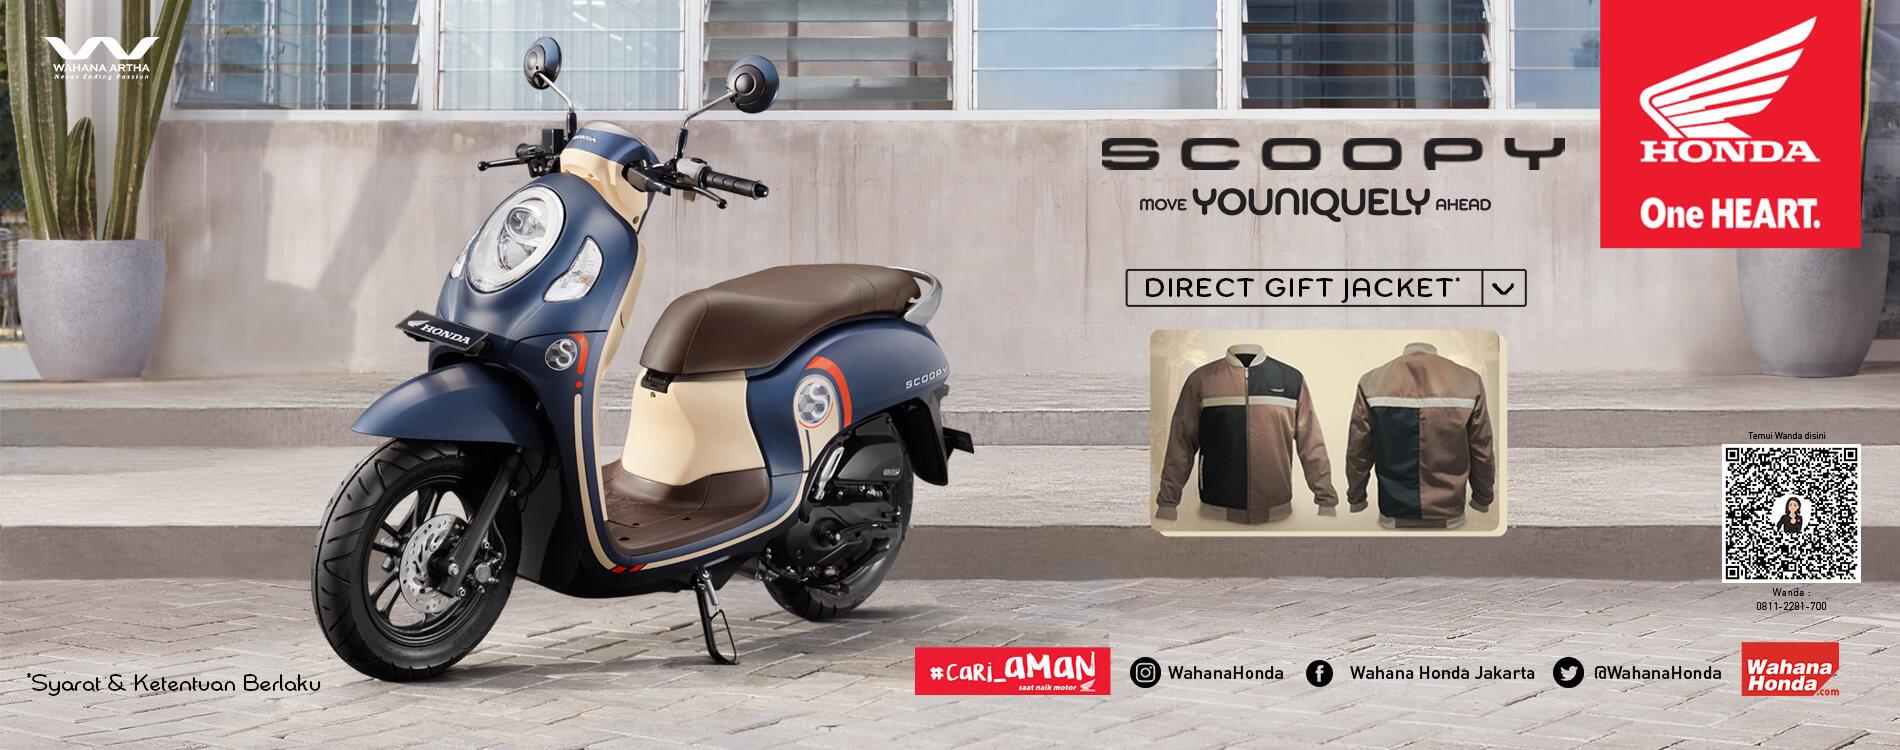 Promo Honda Scoopy - Periode Maret 2021